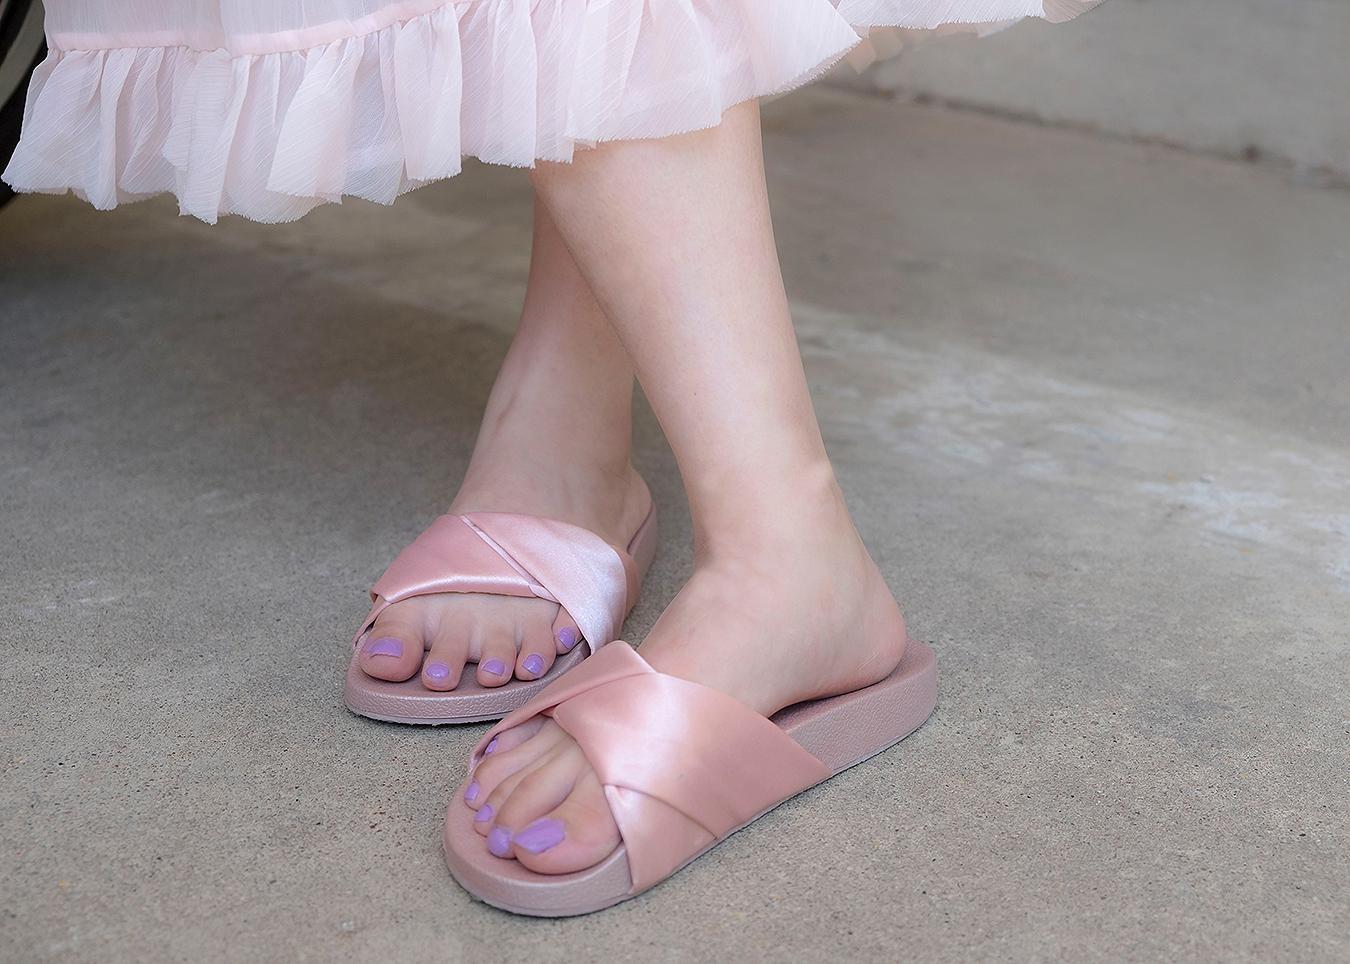 RONGRONG_LIU_STREET_fashion_photography_modern_toe_nail_polish